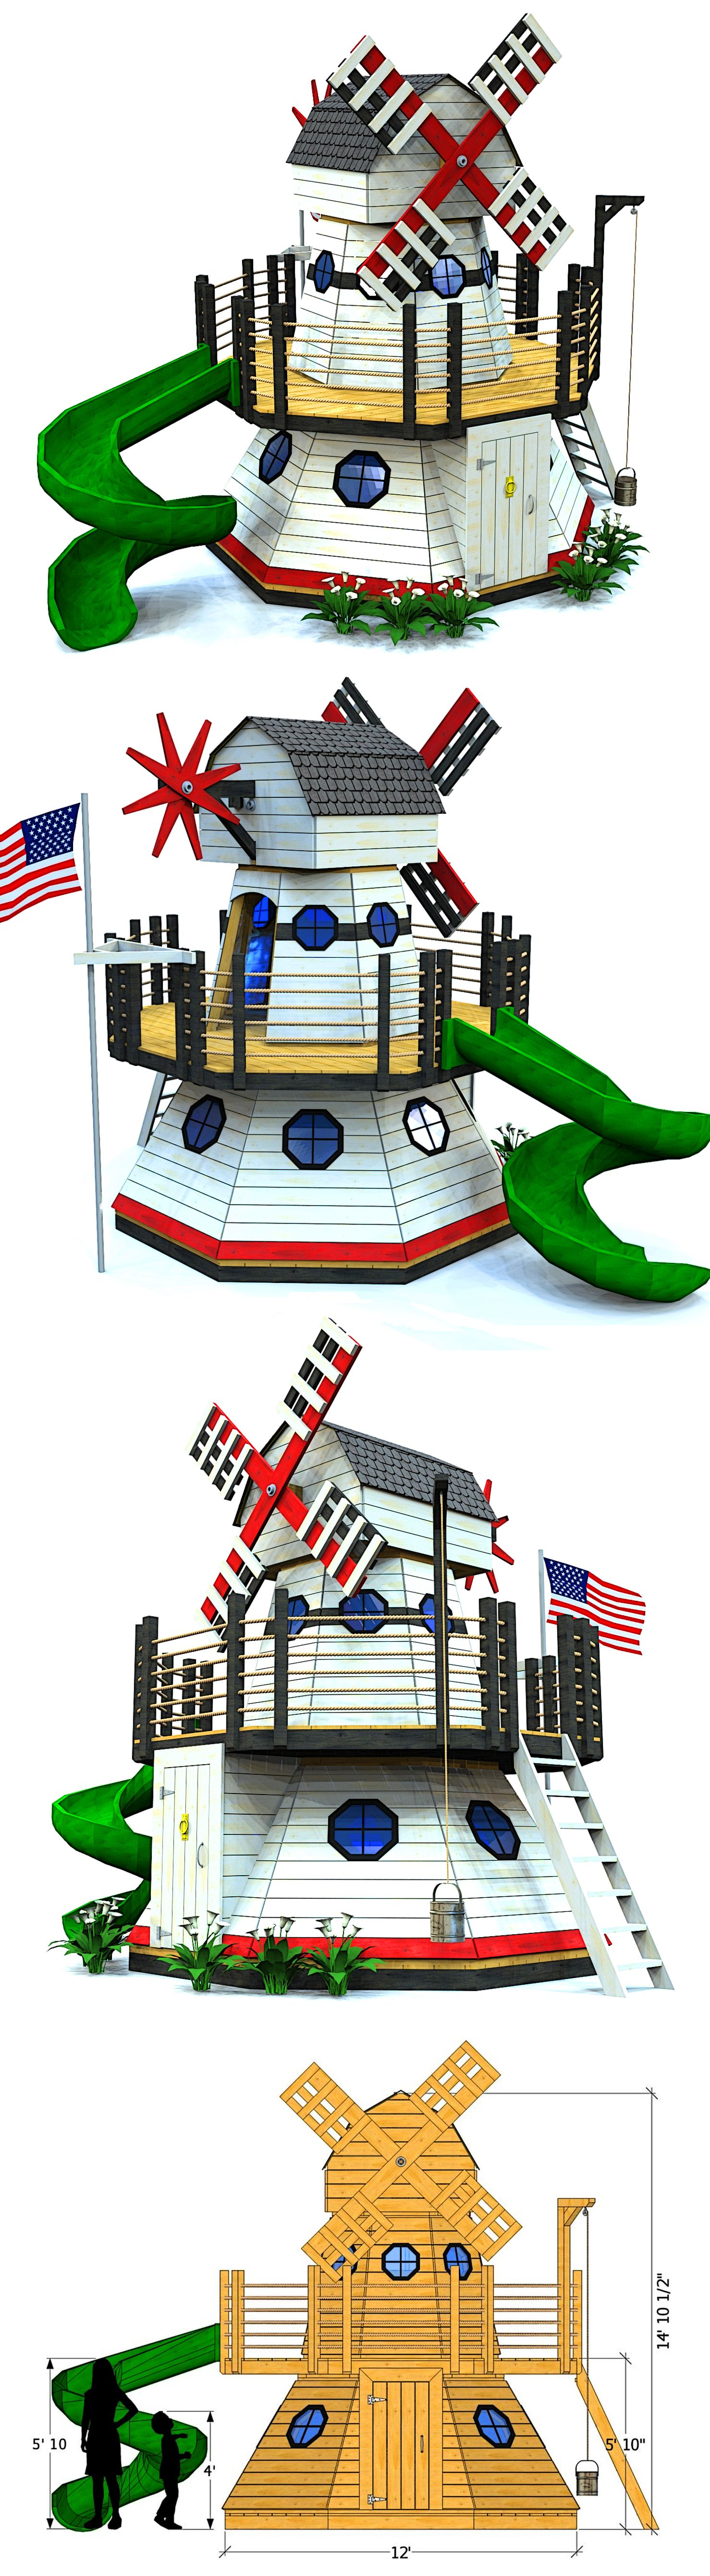 smock windmill playhouse plan playhouse plans playhouses and